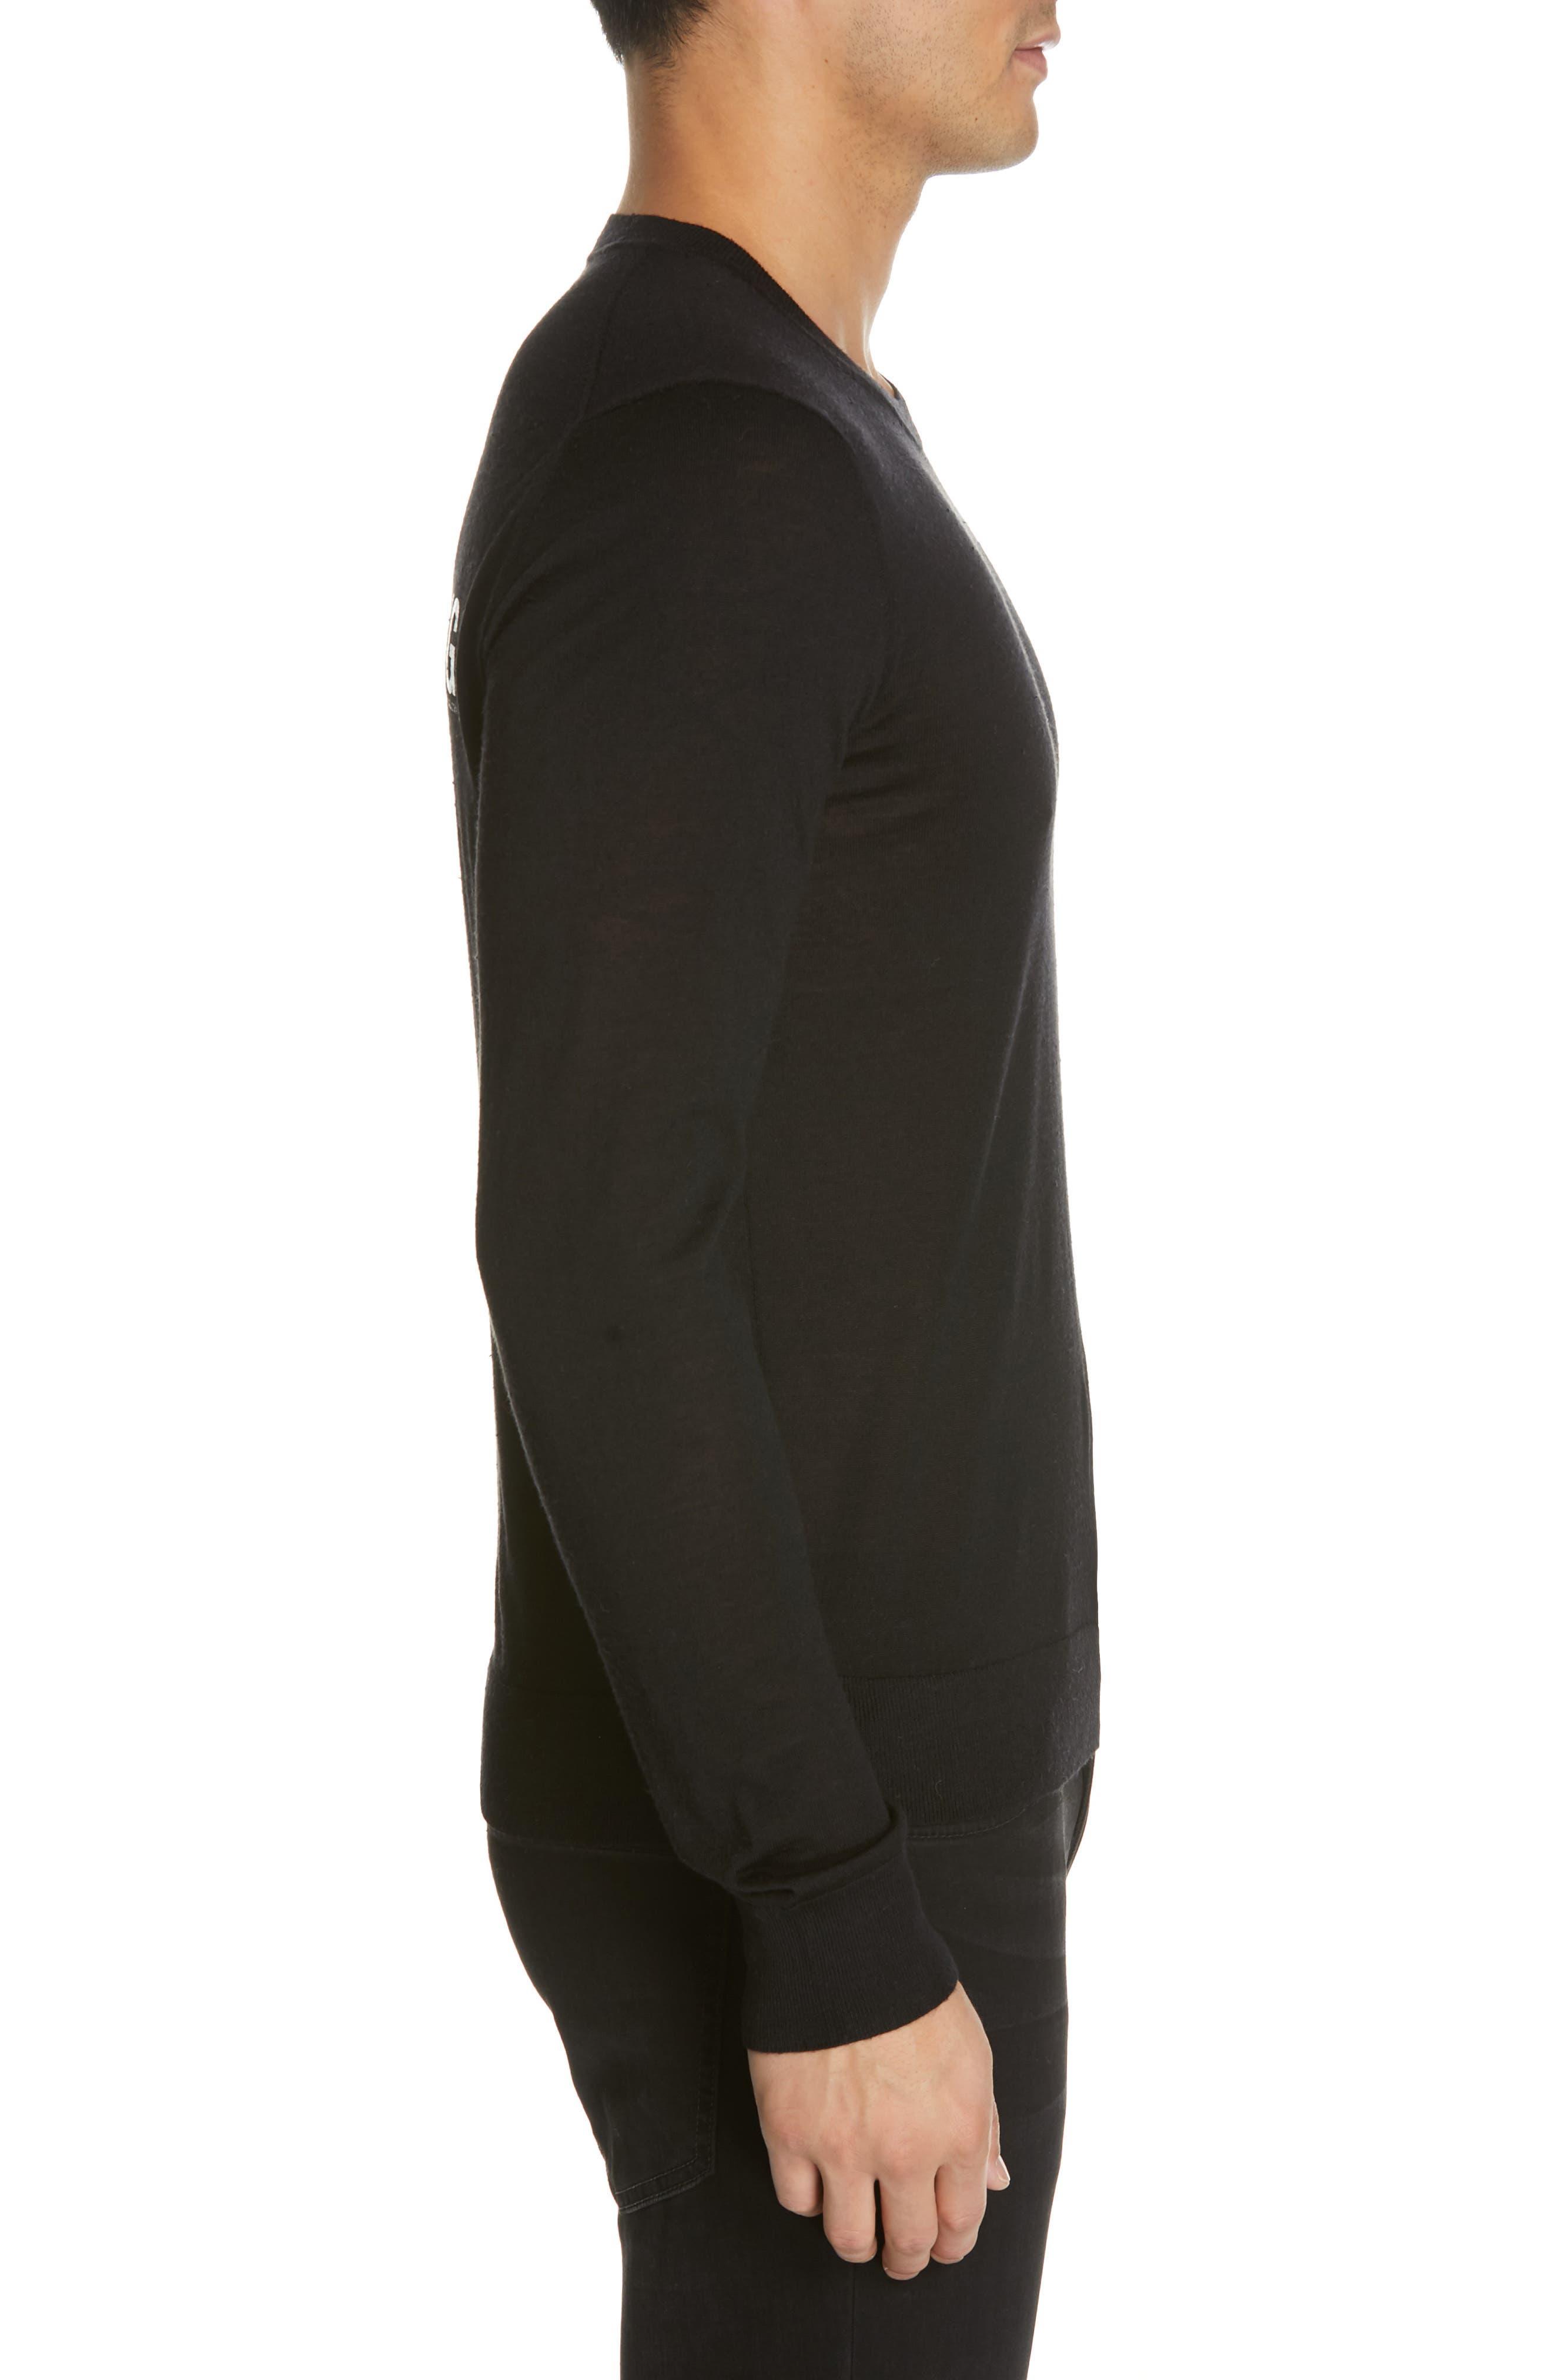 HELMUT LANG, Back Logo Wool & Silk Sweatshirt, Alternate thumbnail 3, color, BLACK